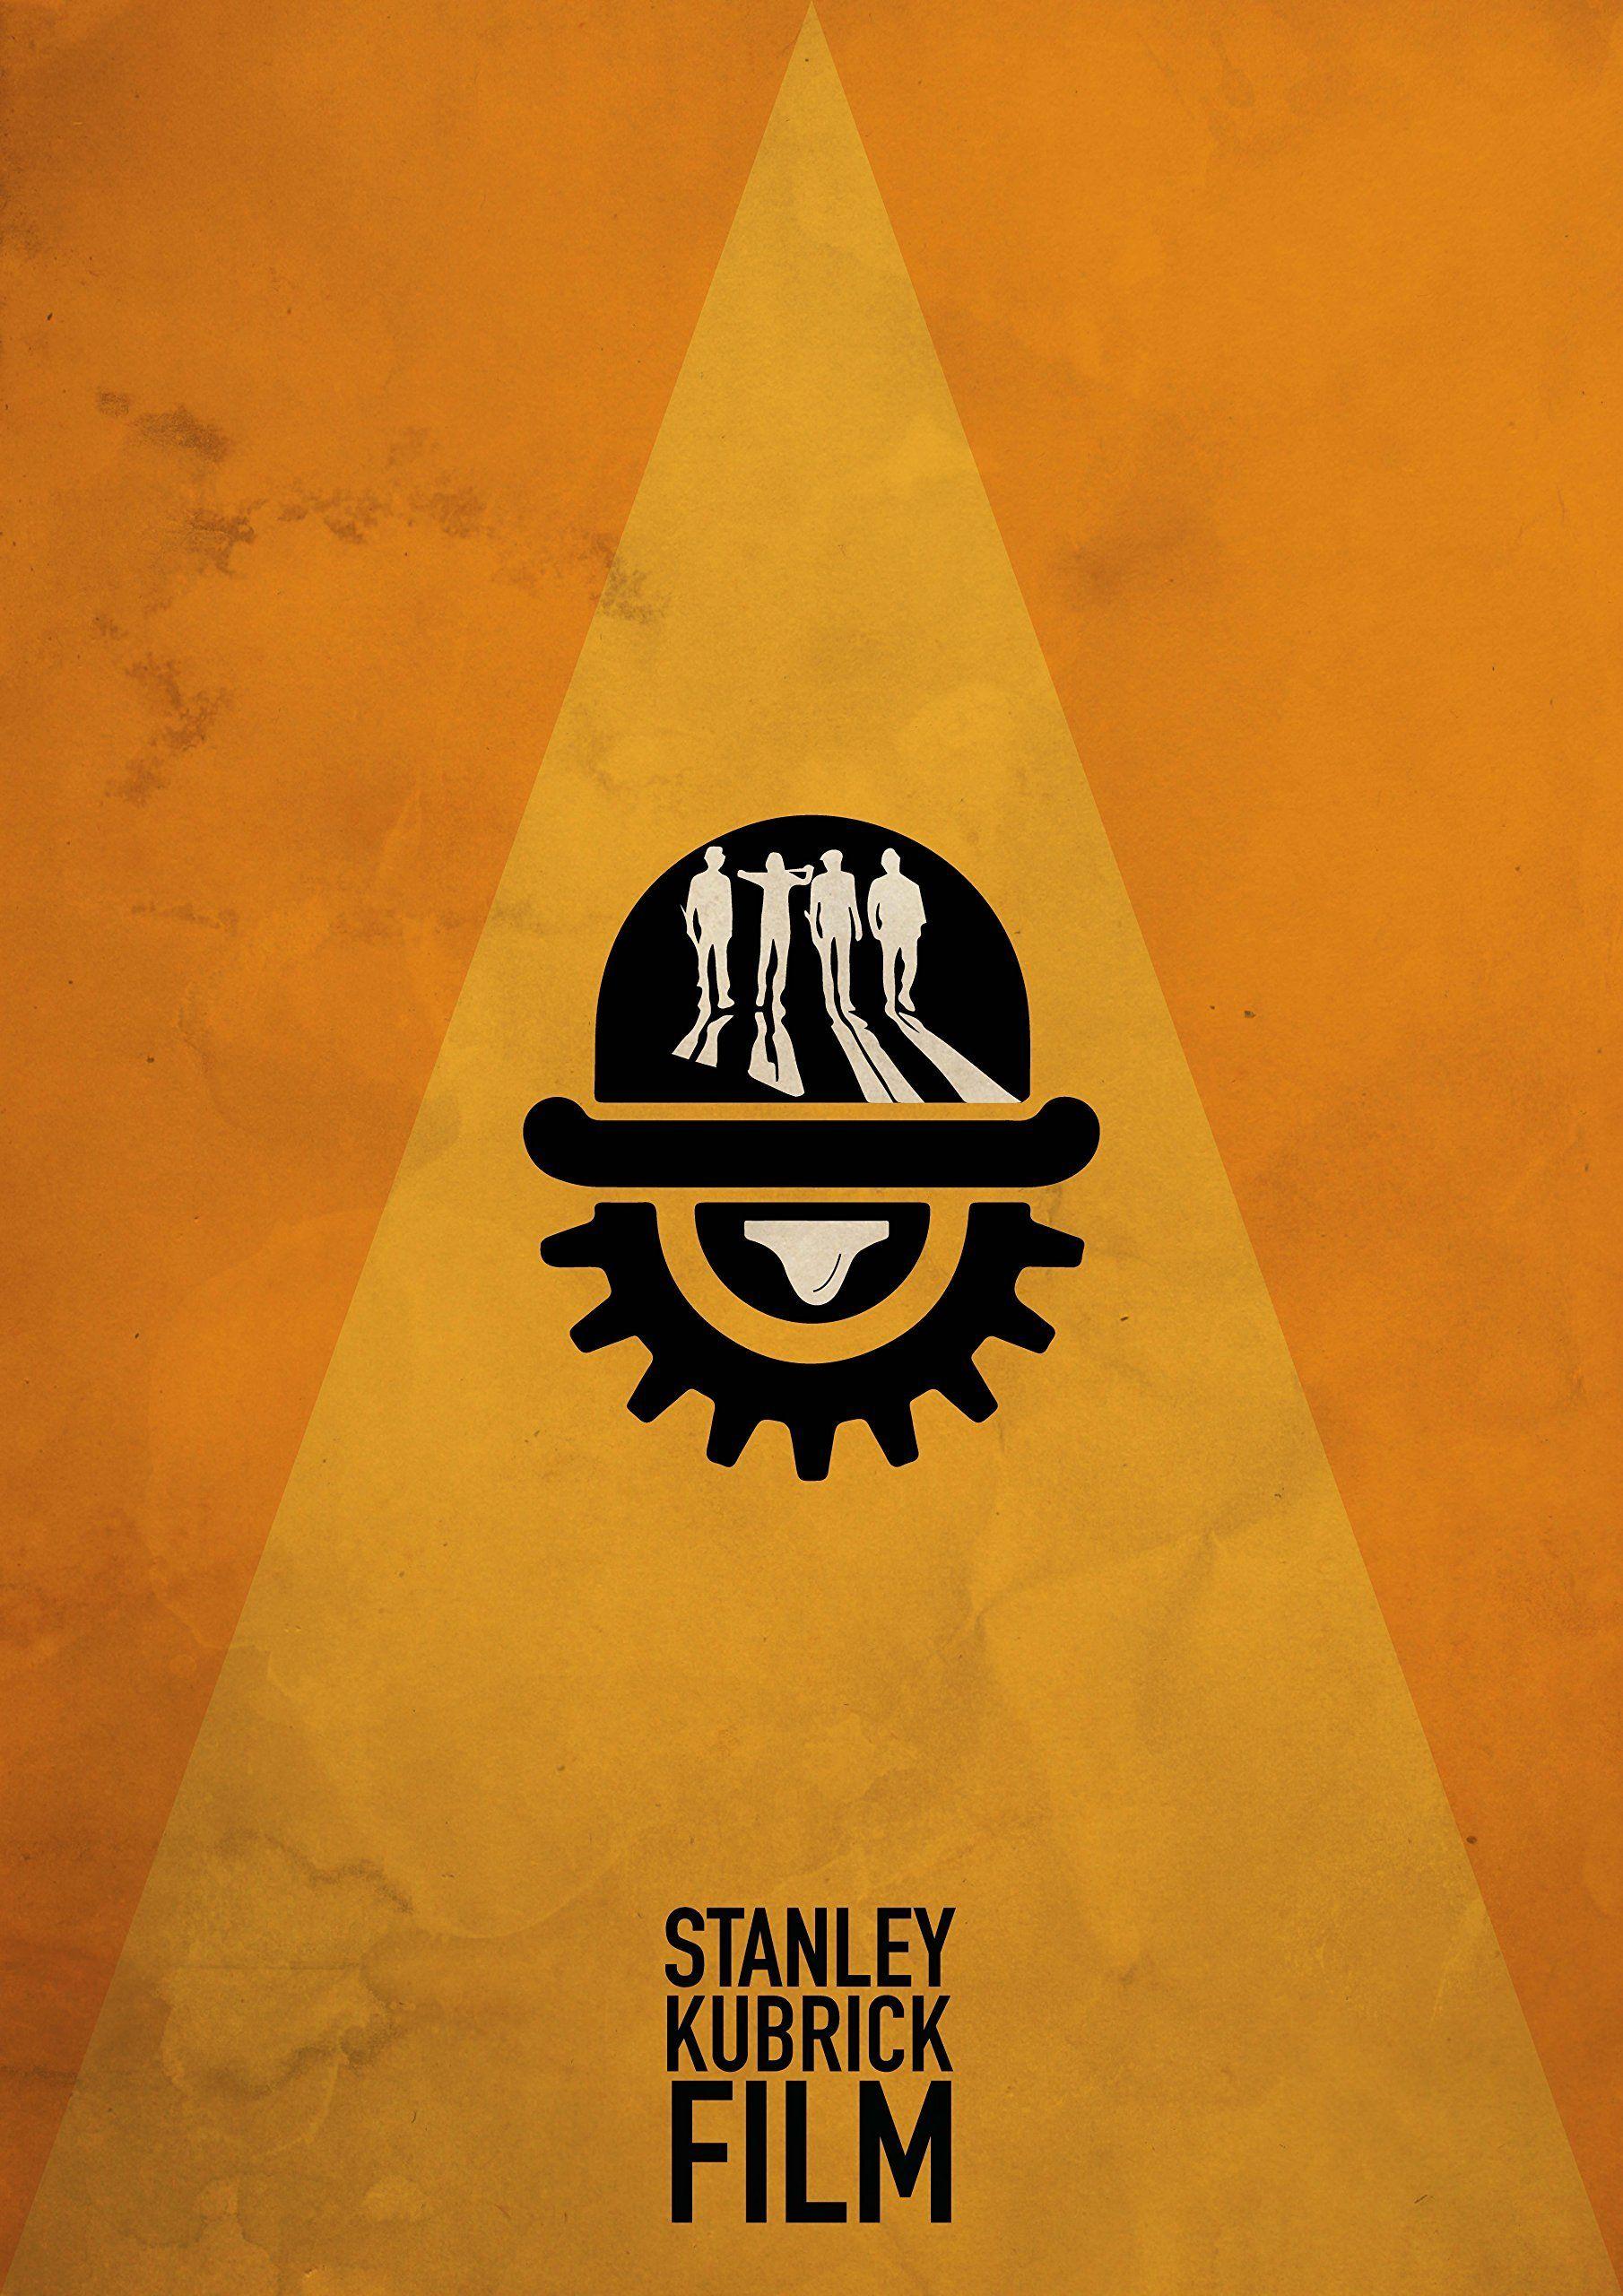 Stanley Kubrick Minimalist Poster Set Of 3 Films The Shining A